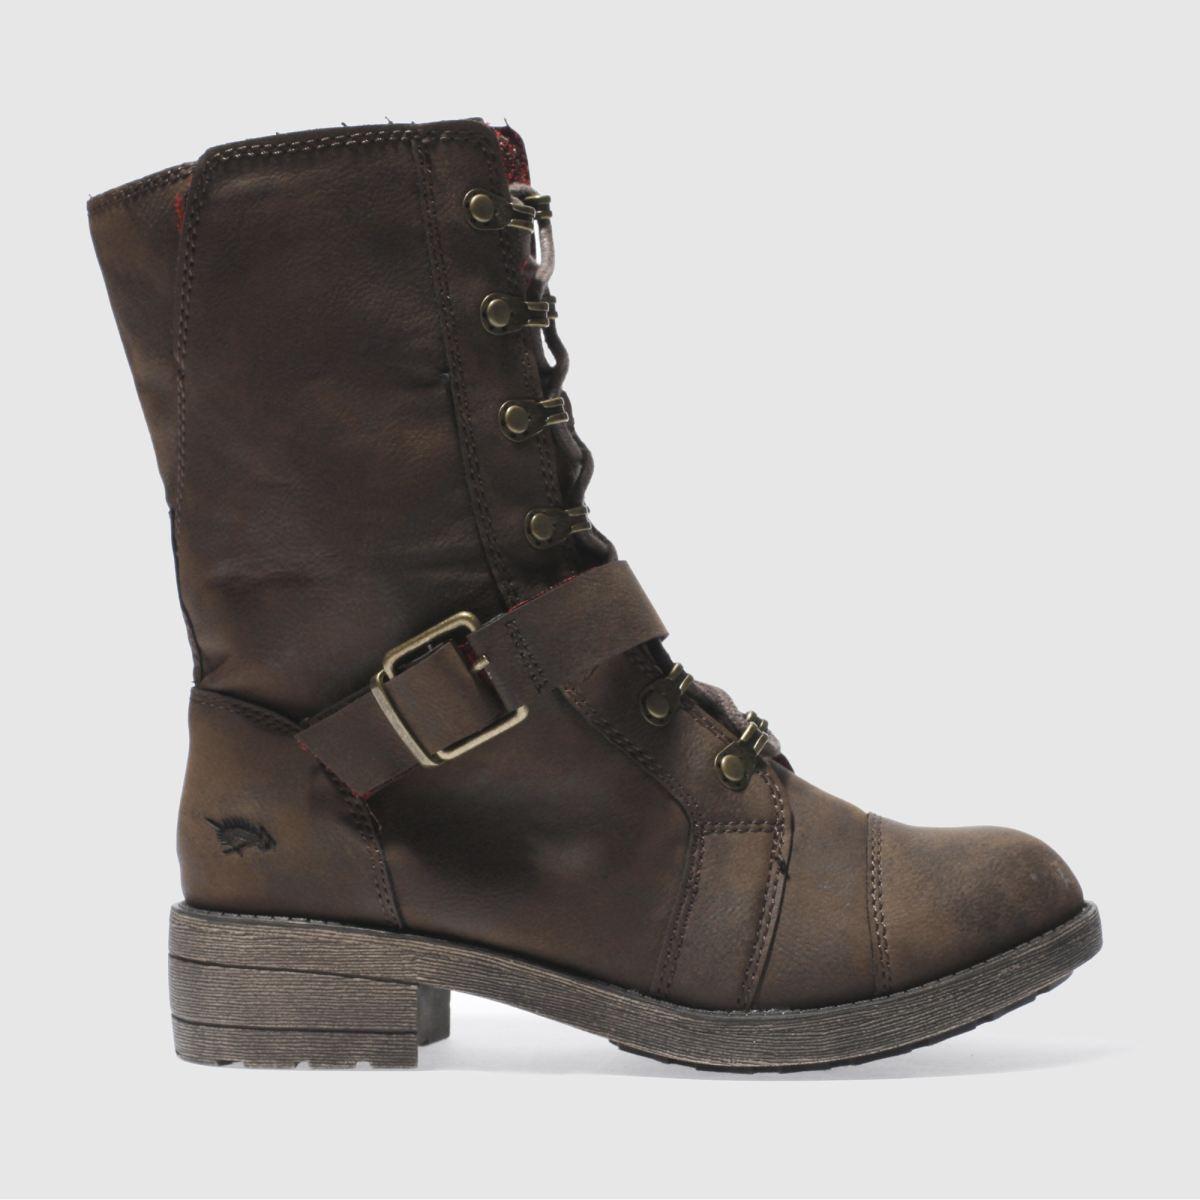 Rocket Dog Brown Tallie Boots